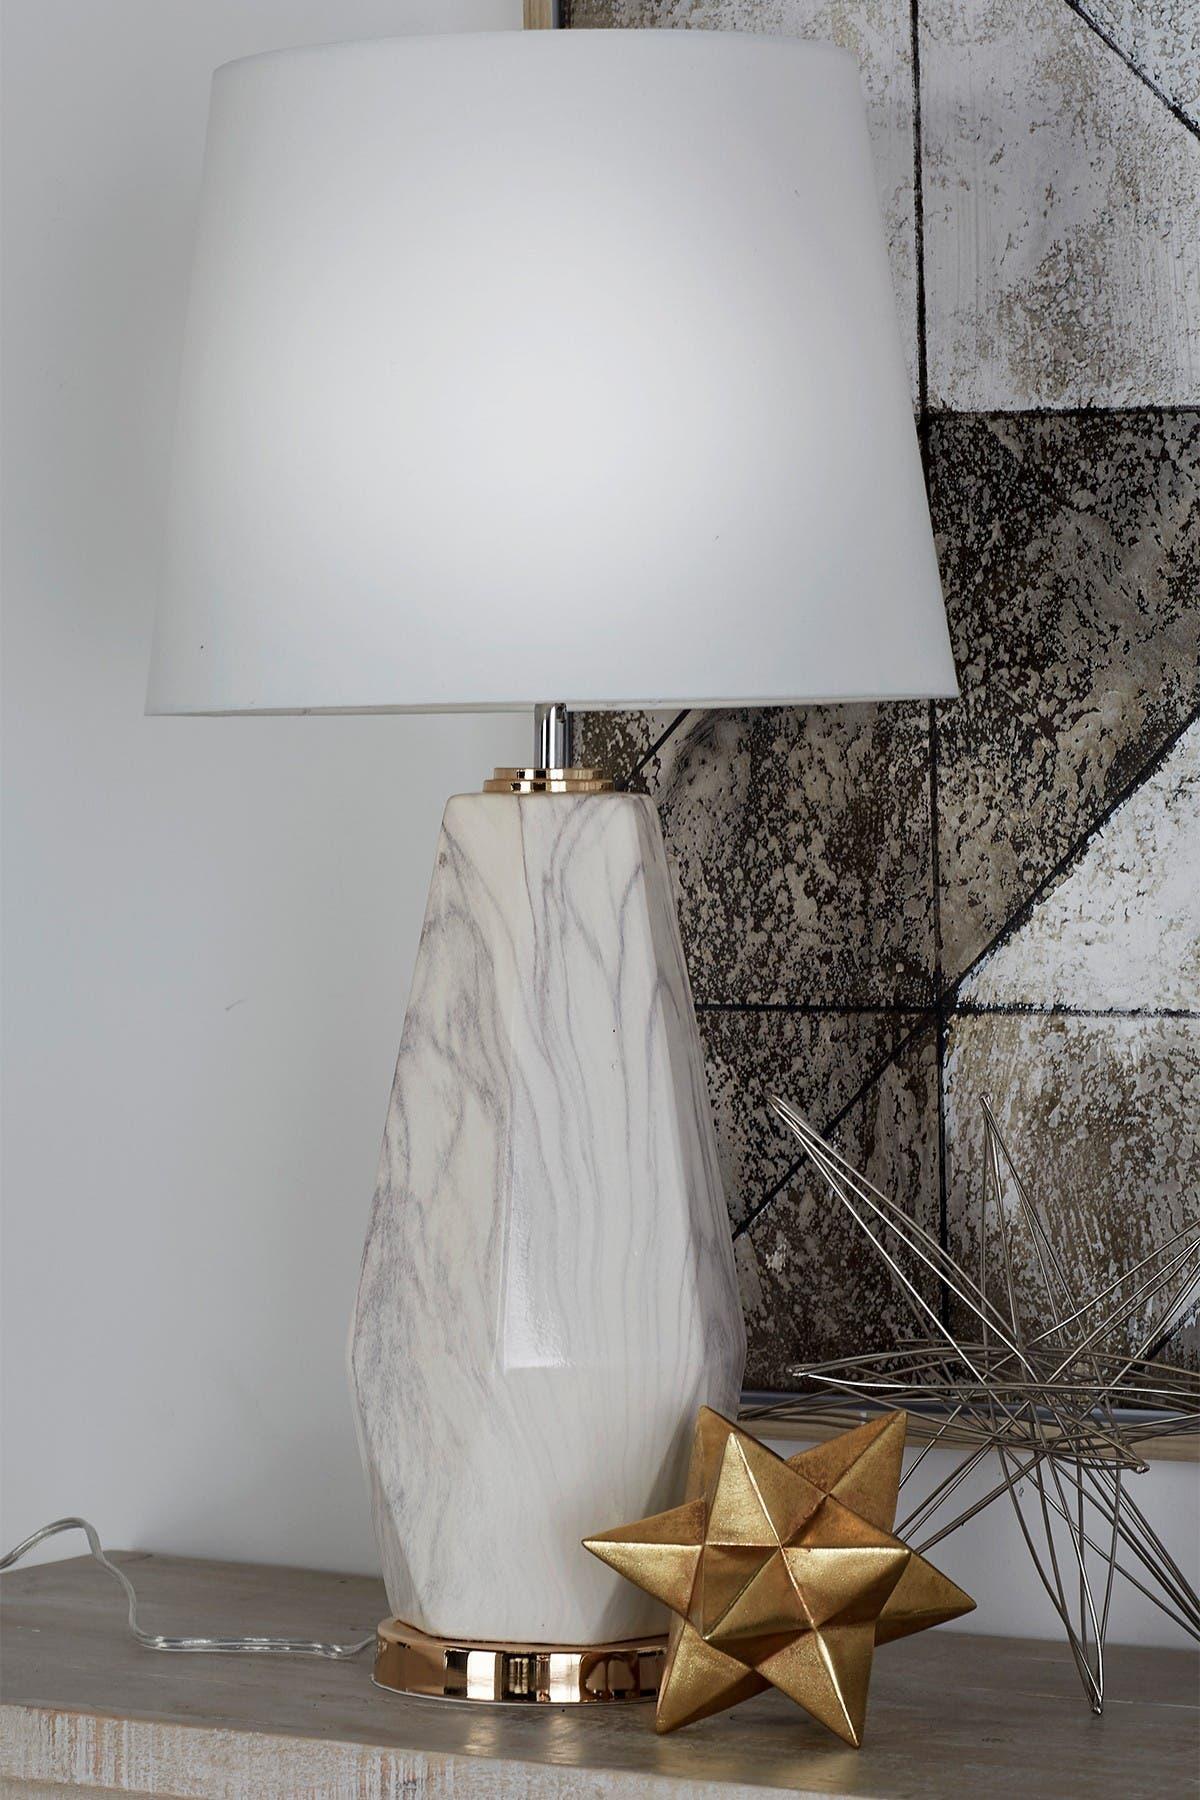 Image of CosmoLiving by Cosmopolitan Ceramic Table Lamp